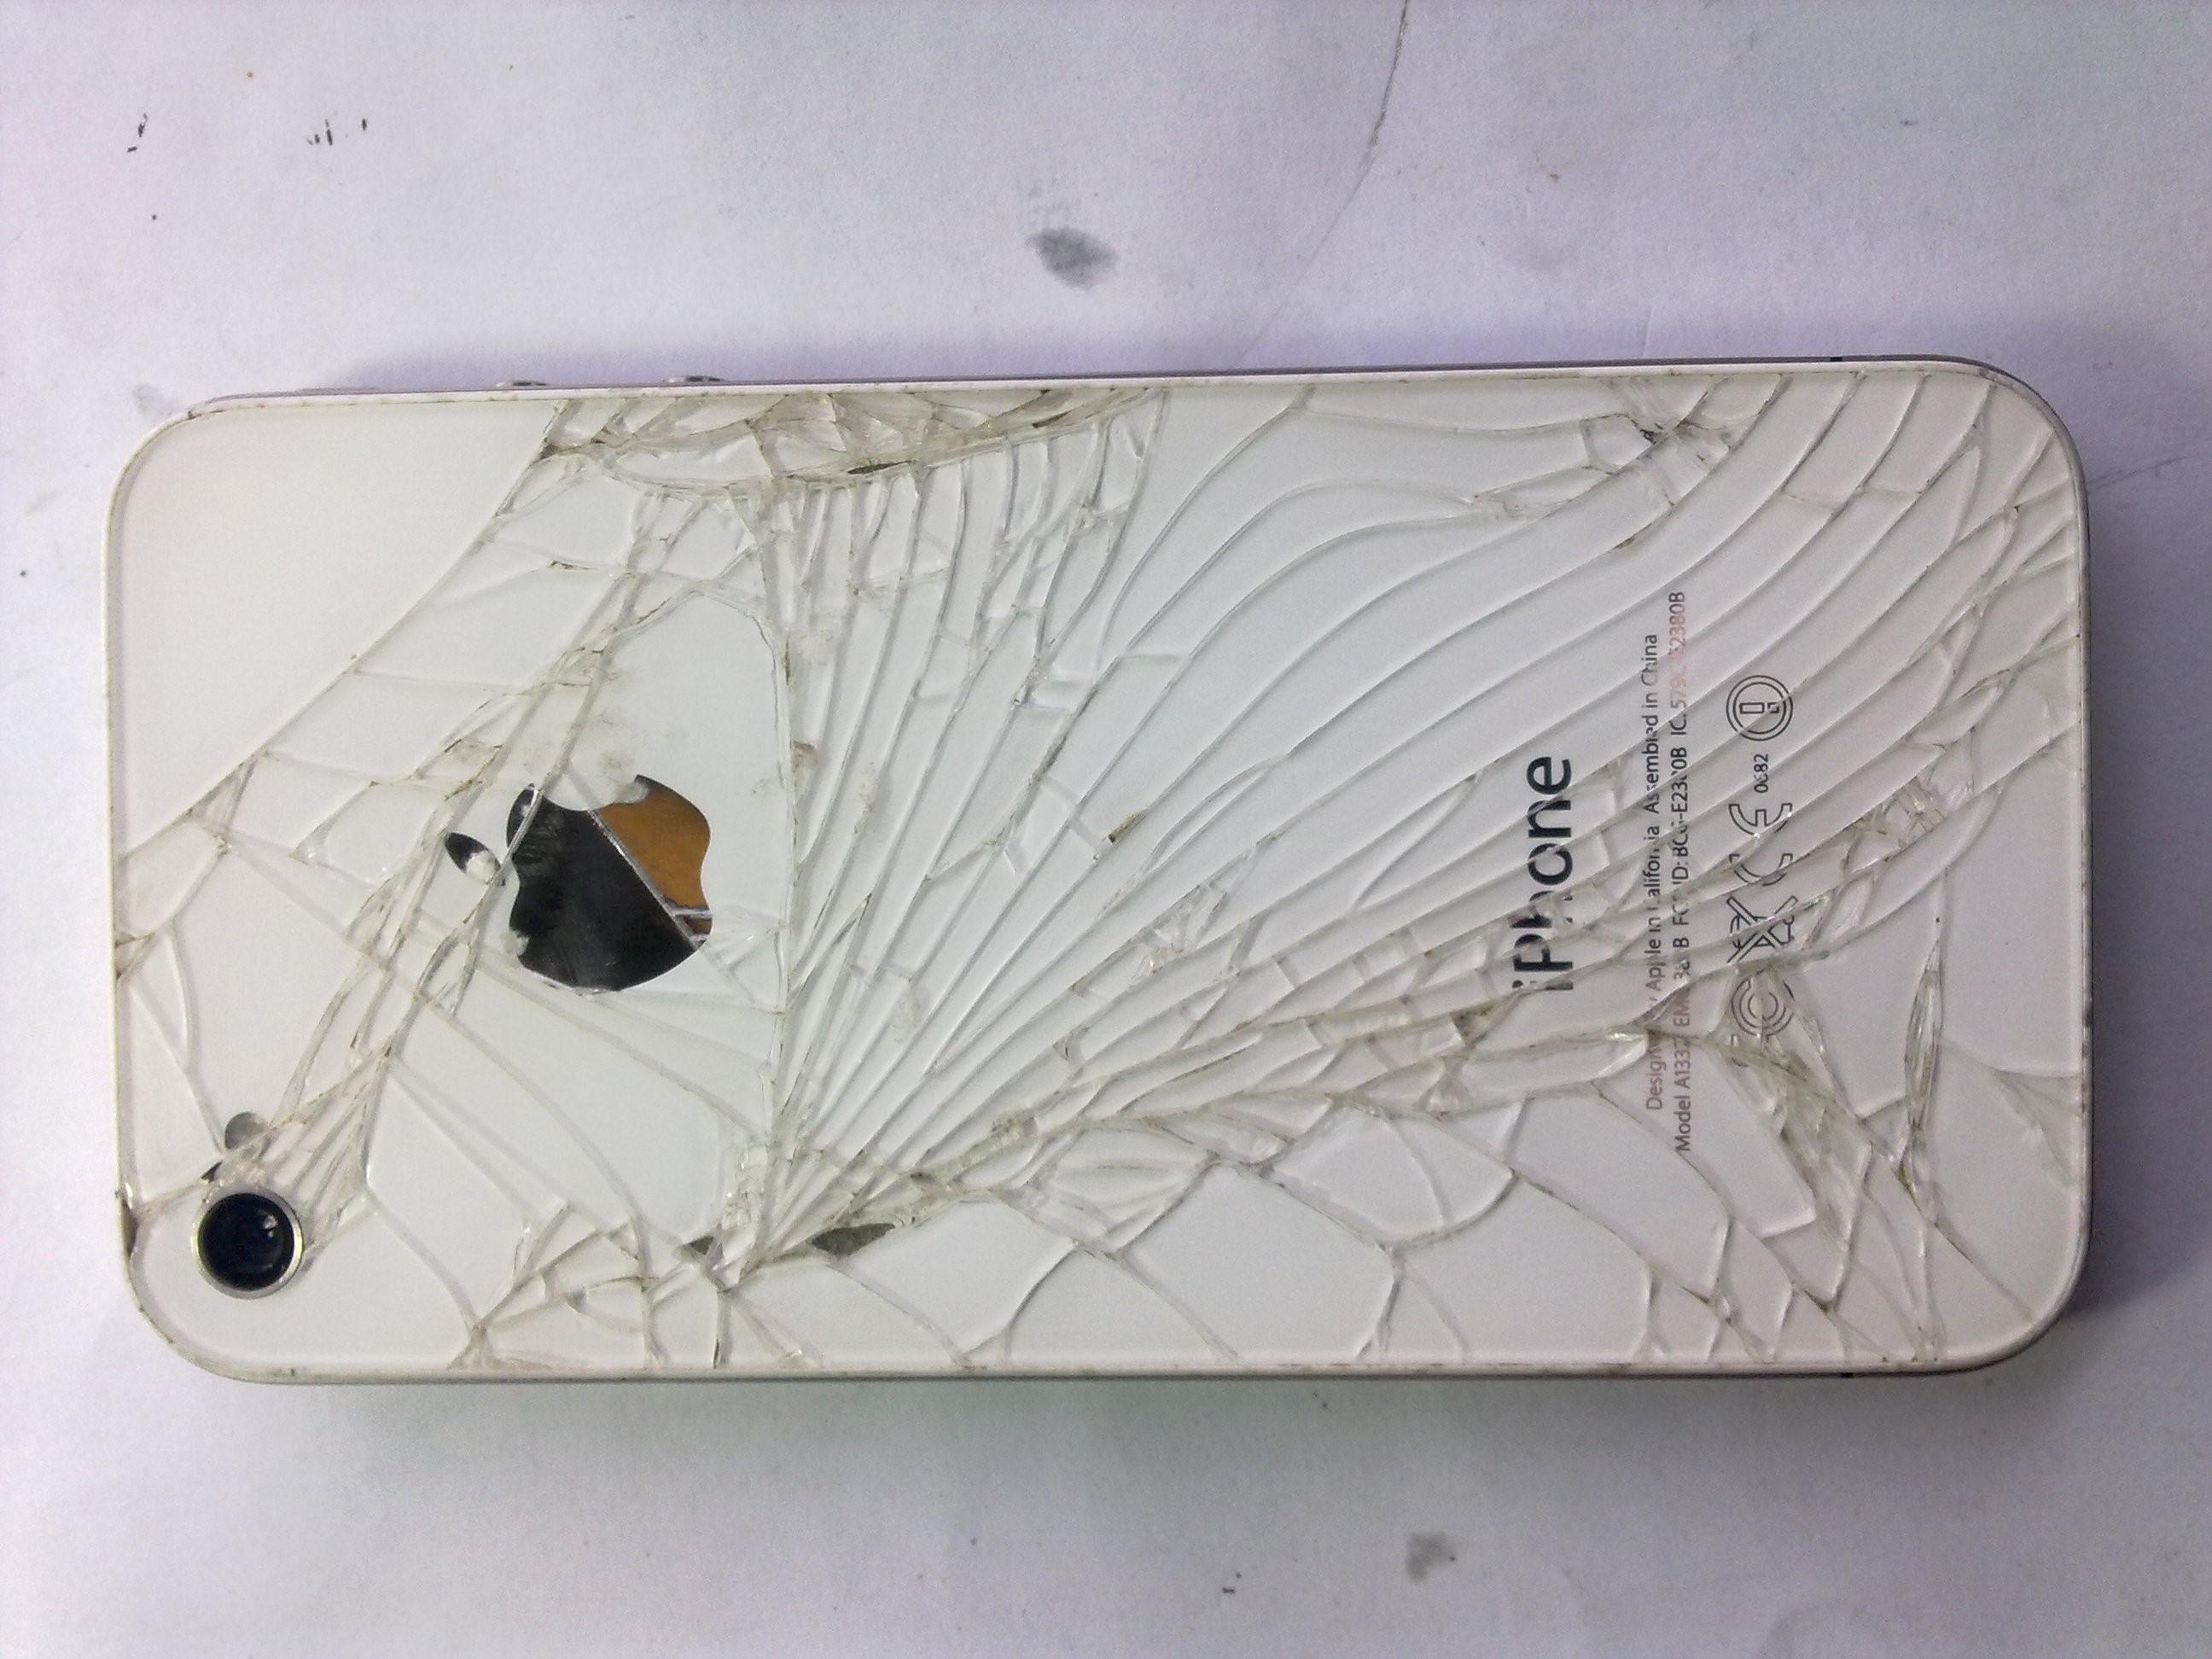 Перестал включаться айфон 4s